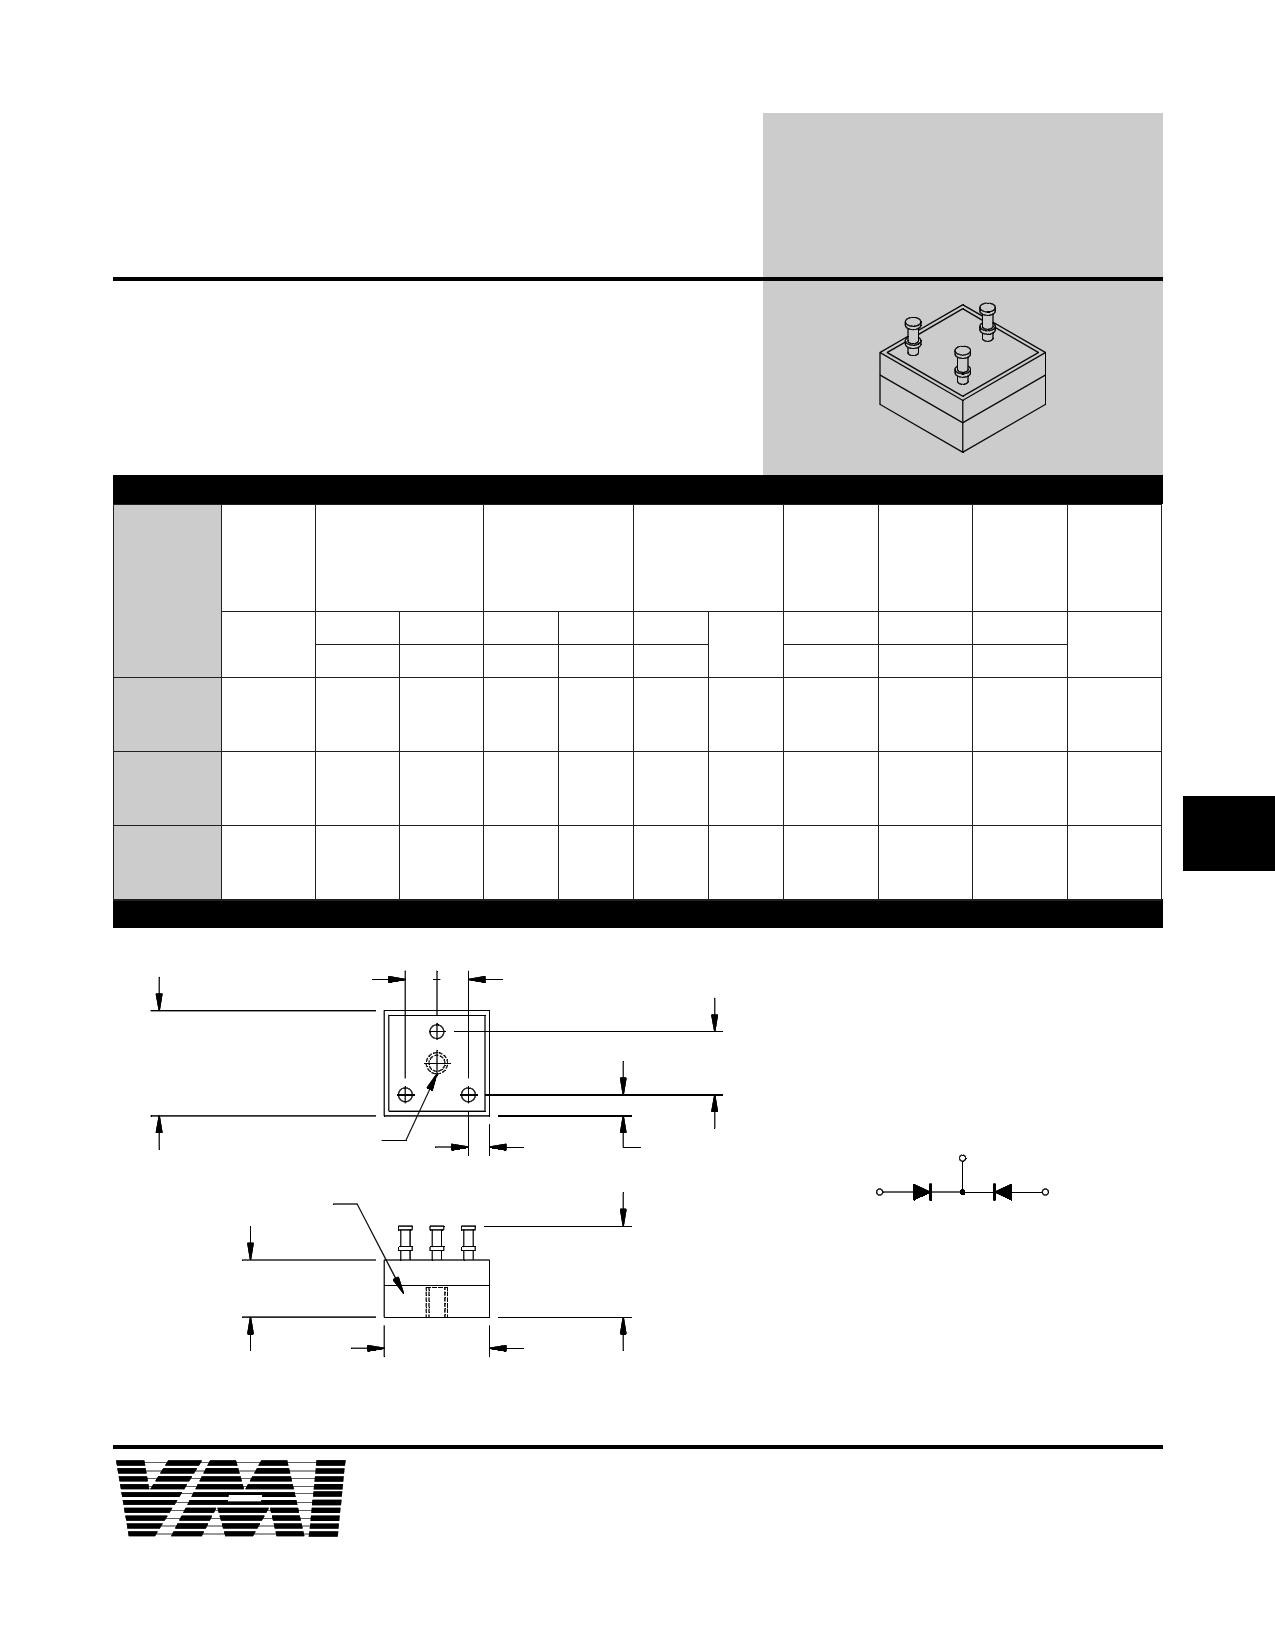 LTI206UFP دیتاشیت PDF